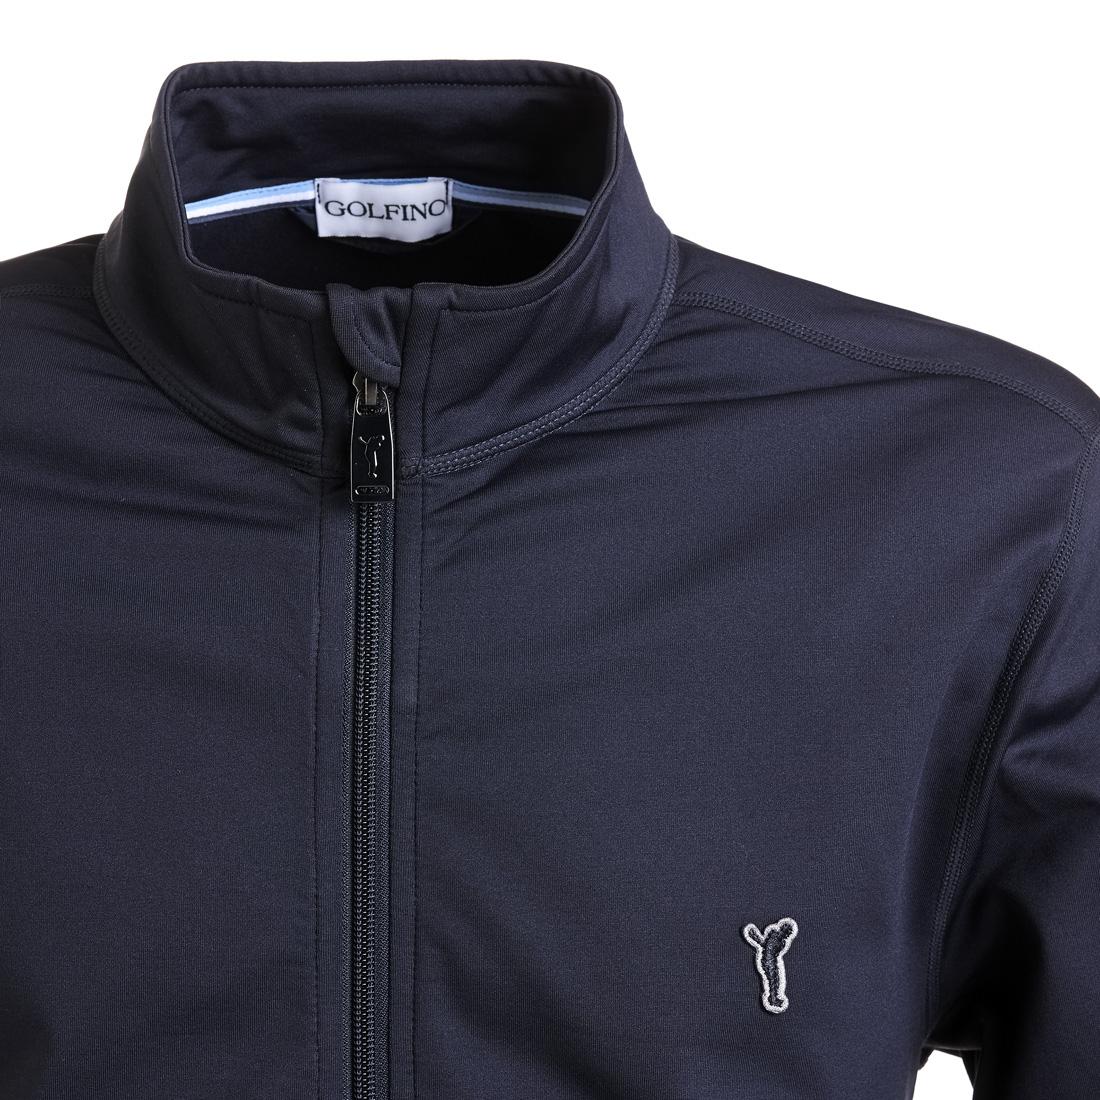 Golf-Fleecejacke mit Techno Stretch in Regular Fit